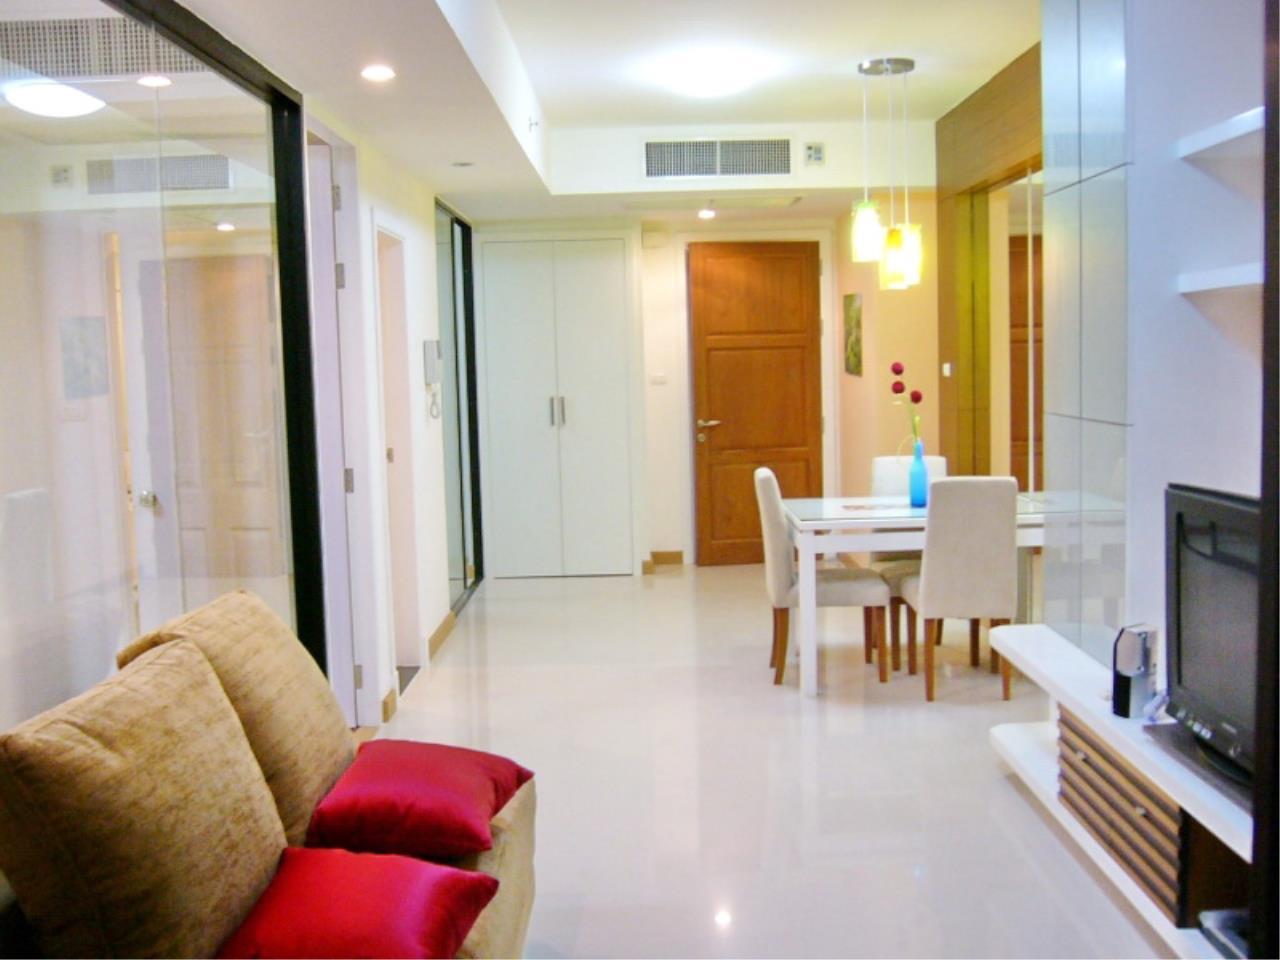 Agent - Mayteekul Sujirapinyokul Agency's AC4180418 For Rent Condo Supalai Premier Place Asoke Condo MRT Phetchaburi 5